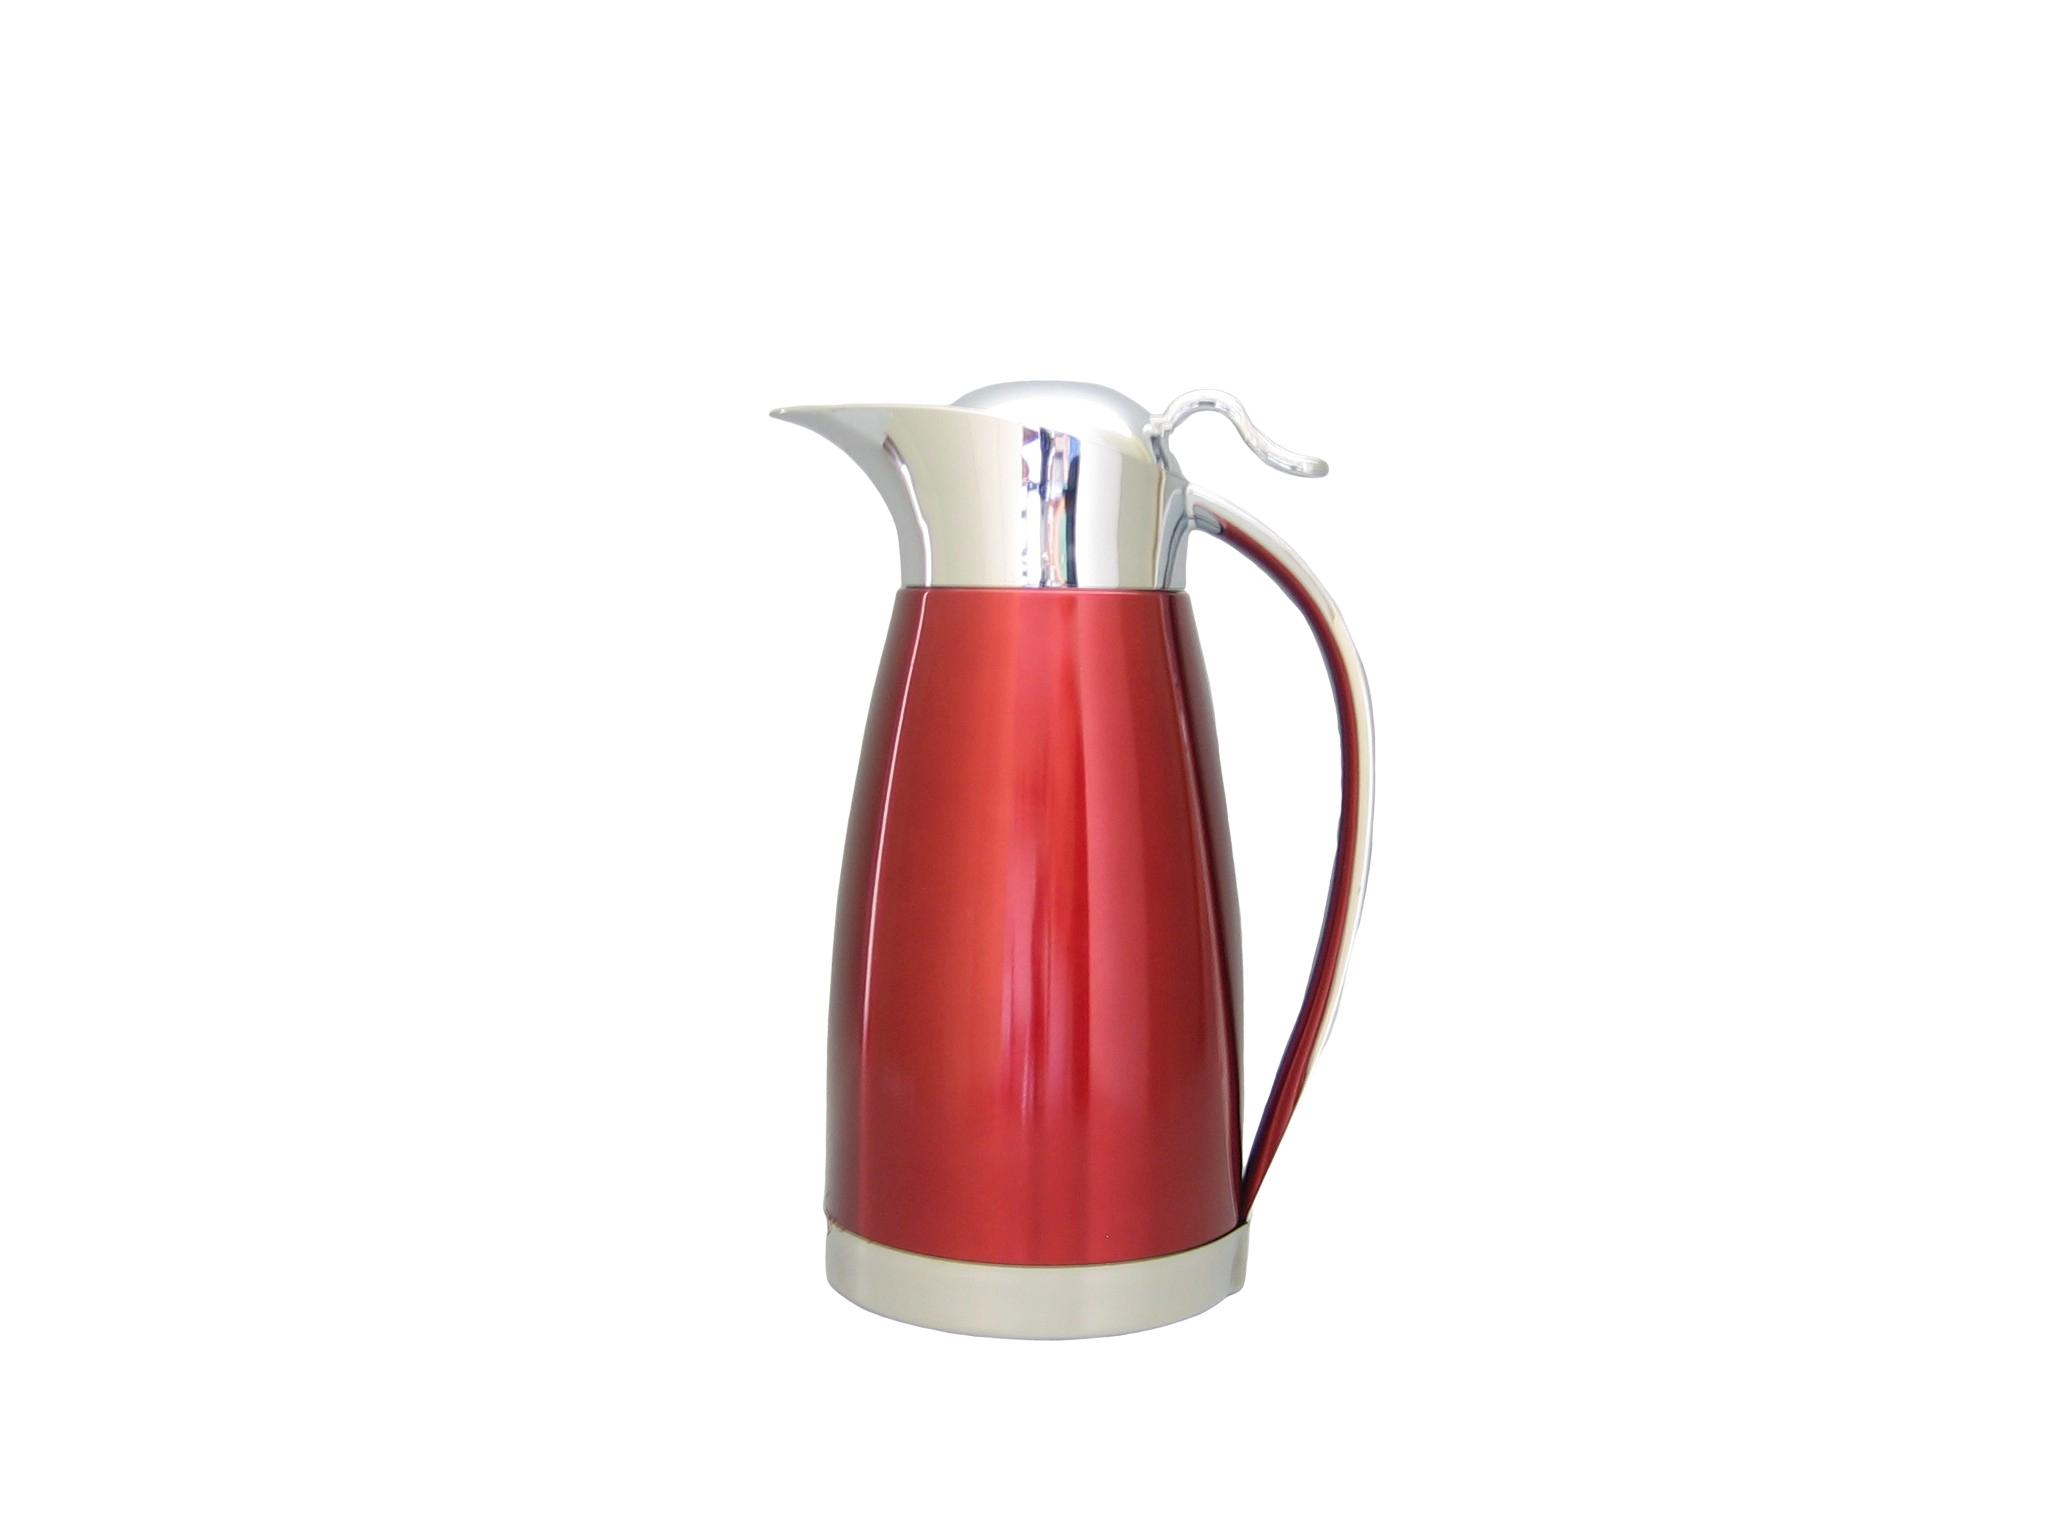 HK1200-072 - Pichet inox incassable coating rouge 1.2 L - Isobel